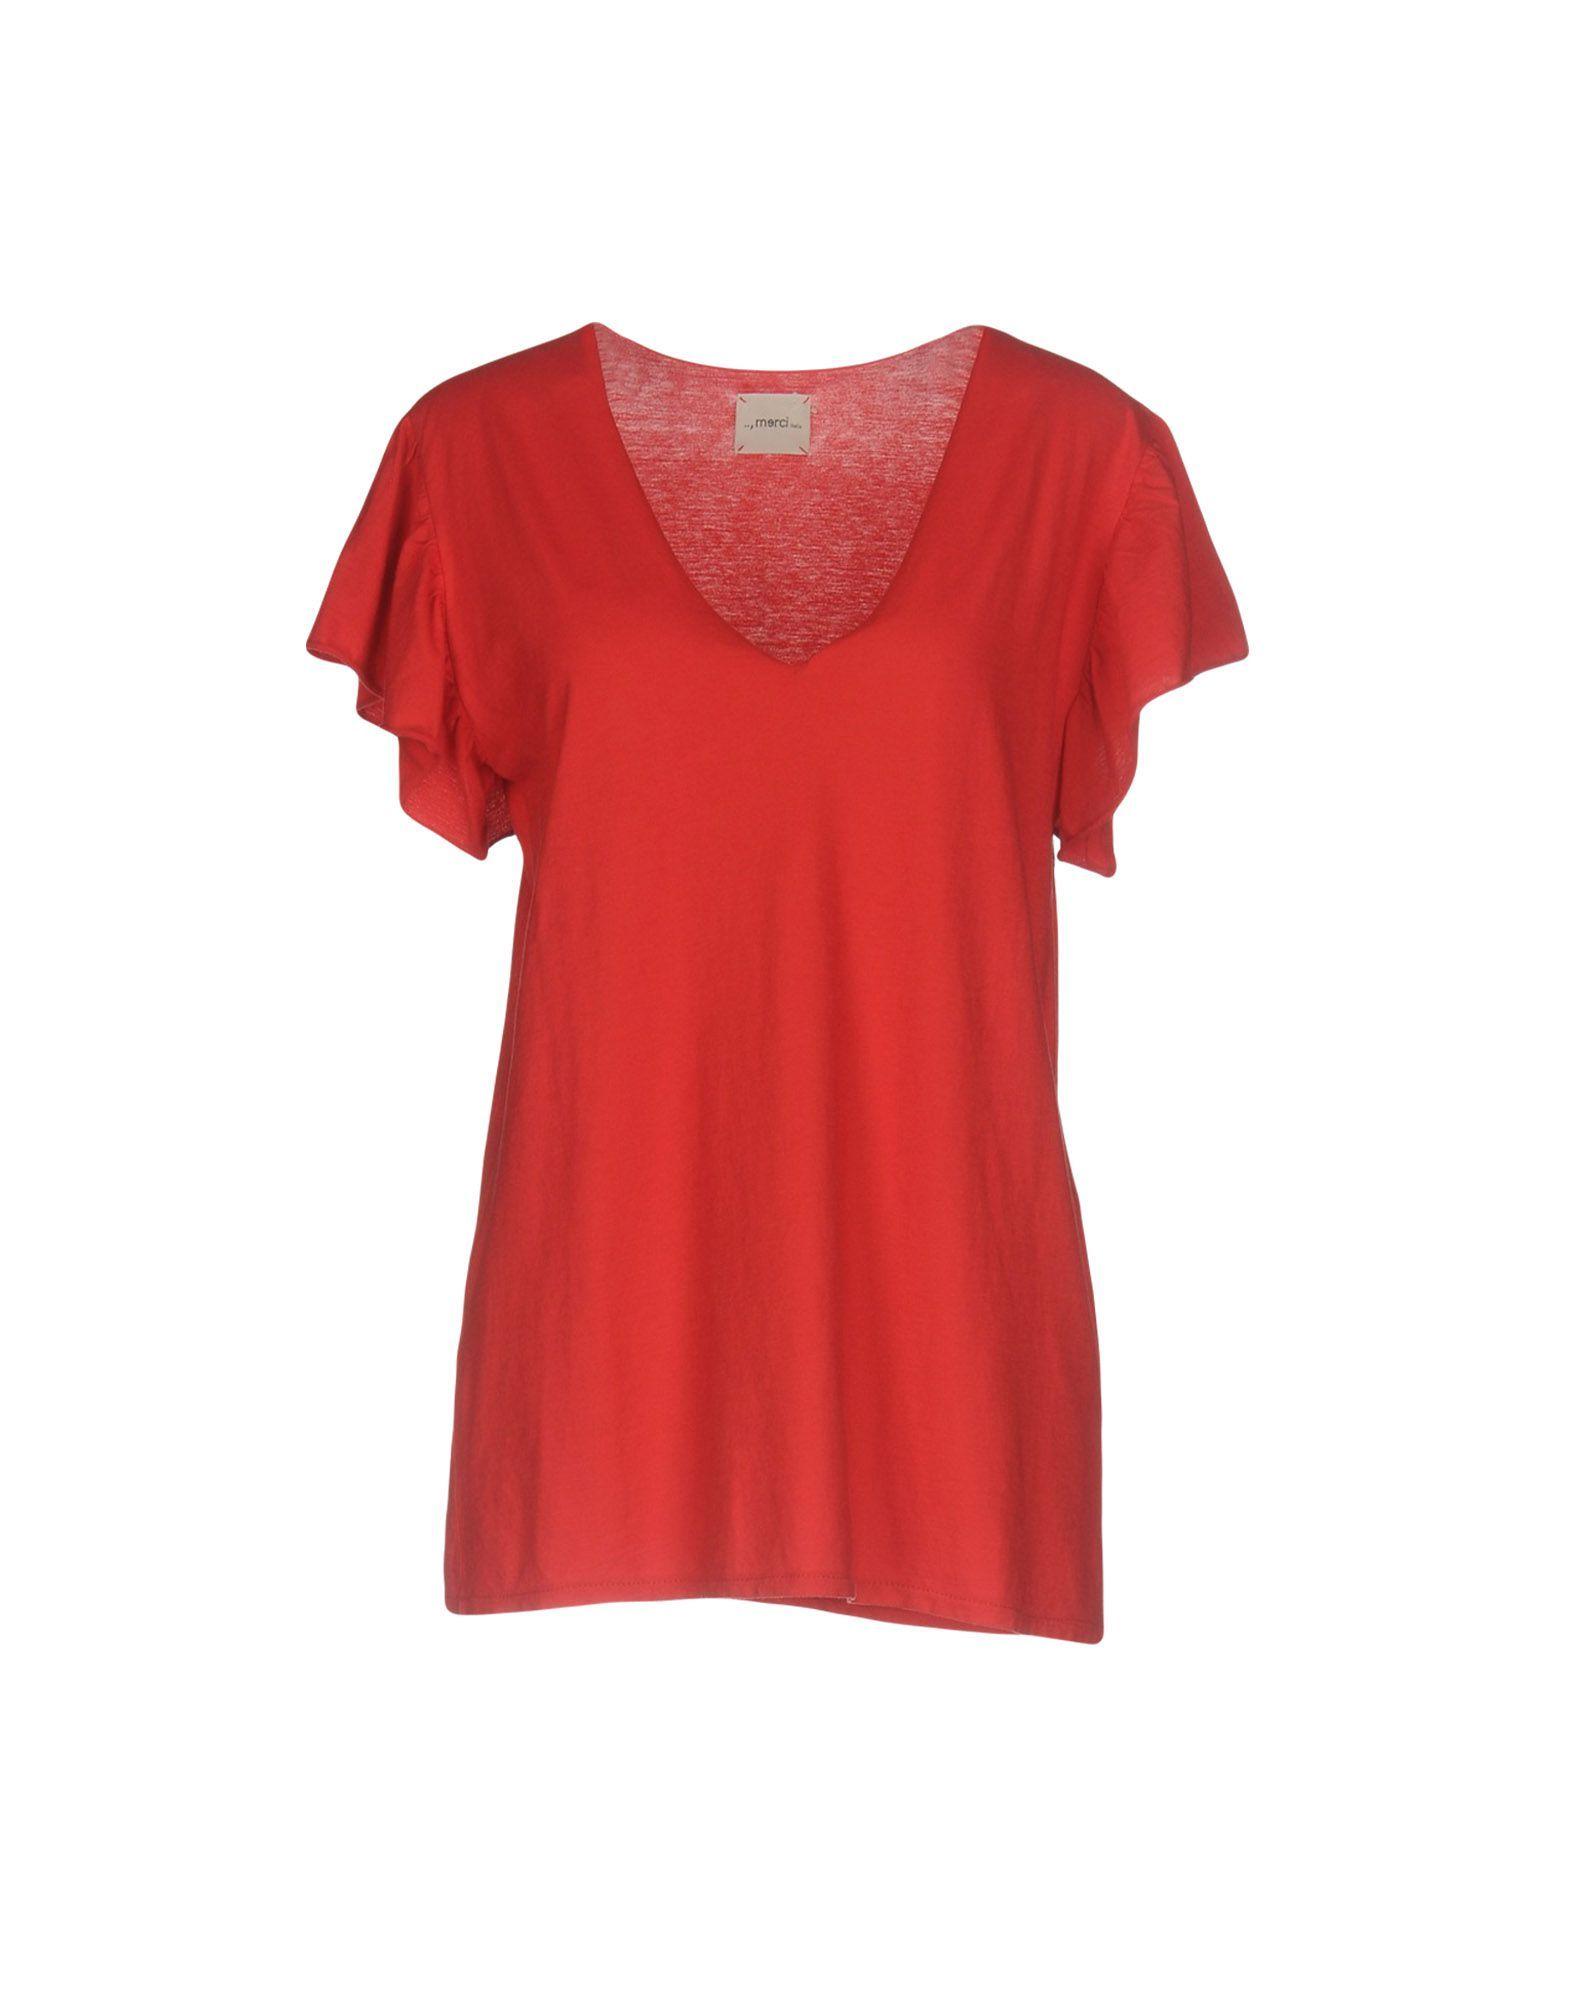 Merci Red Cotton T-Shirt